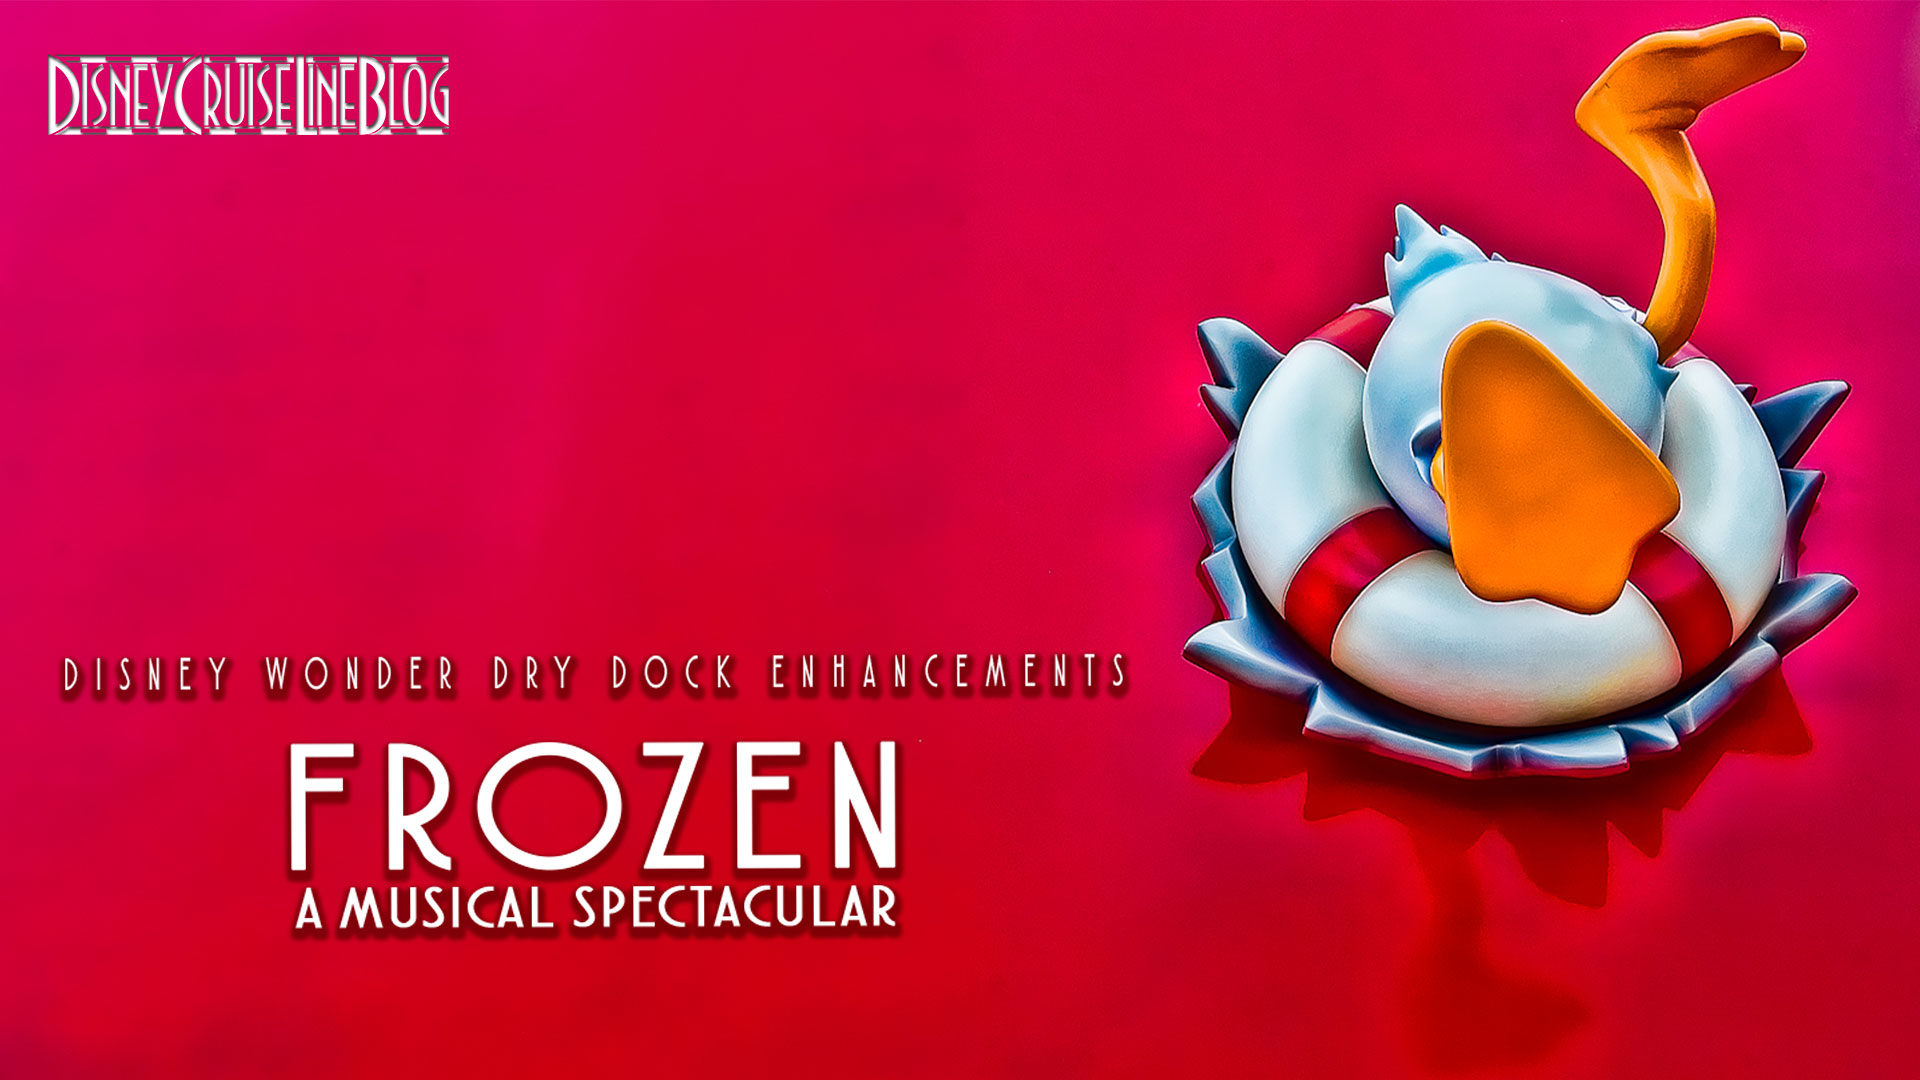 Wonder Dry Dock Enhancements Frozen Musical Video